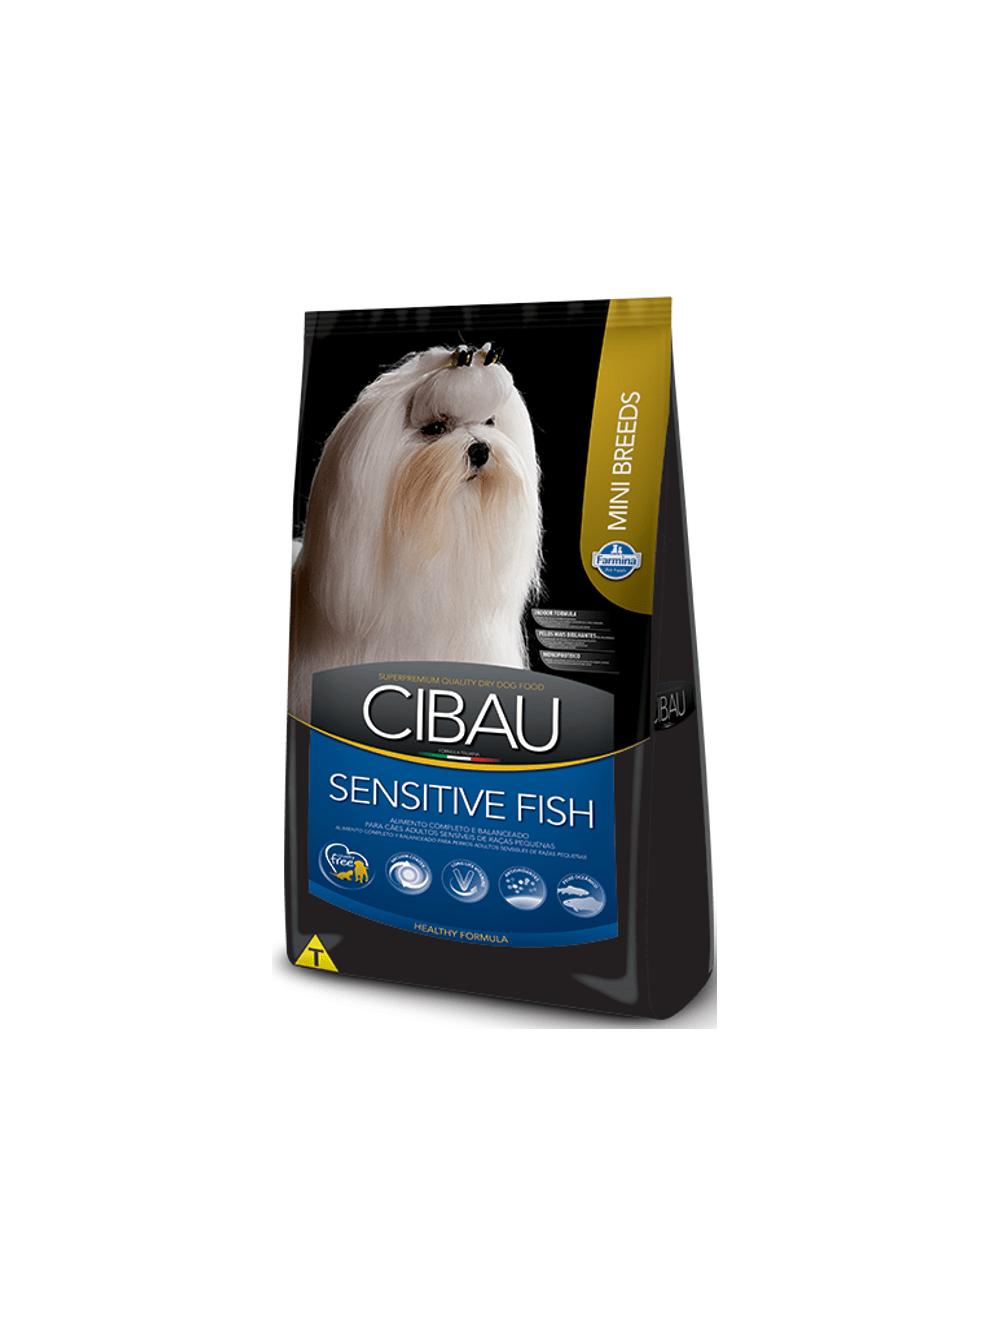 Comida para Perros Cibau Sensitive Fish-Ciudaddemascotas.com